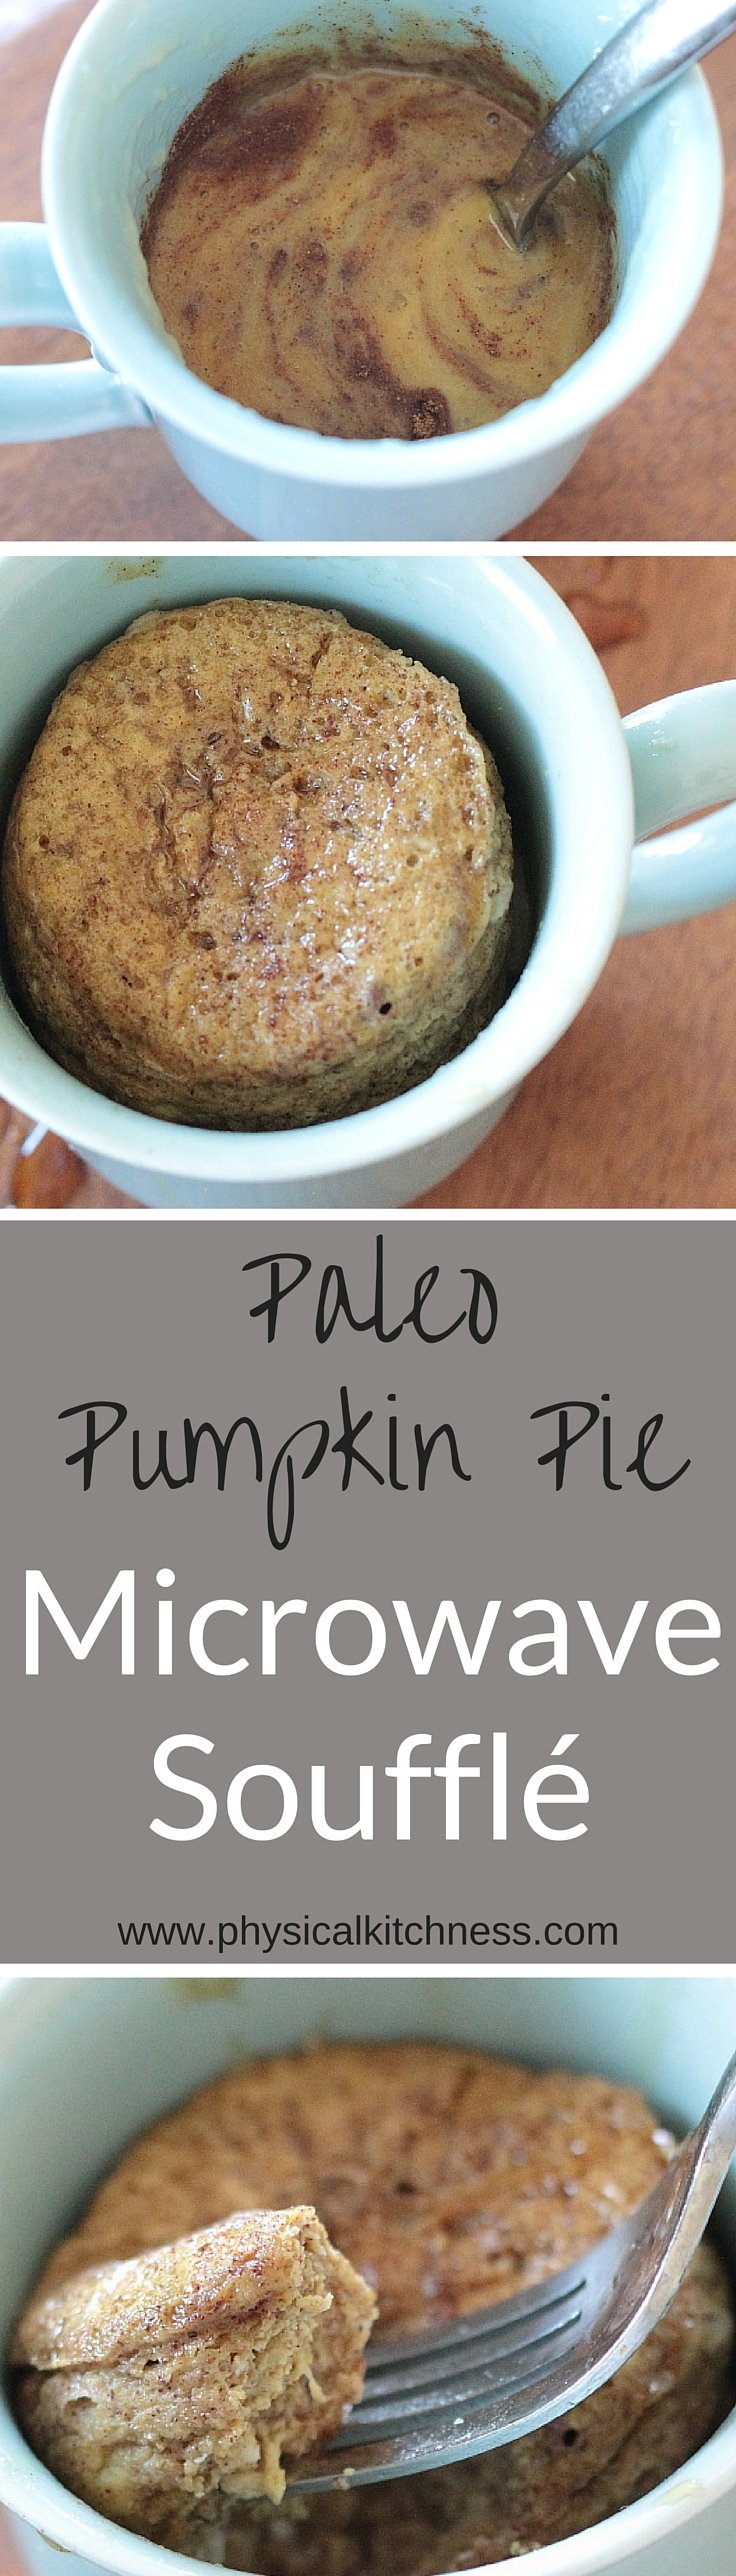 5-minute, Paleo Pumpkin Pie Microwave Soufflé. A warm and delicious, gluten-free, dairy-free breakfast